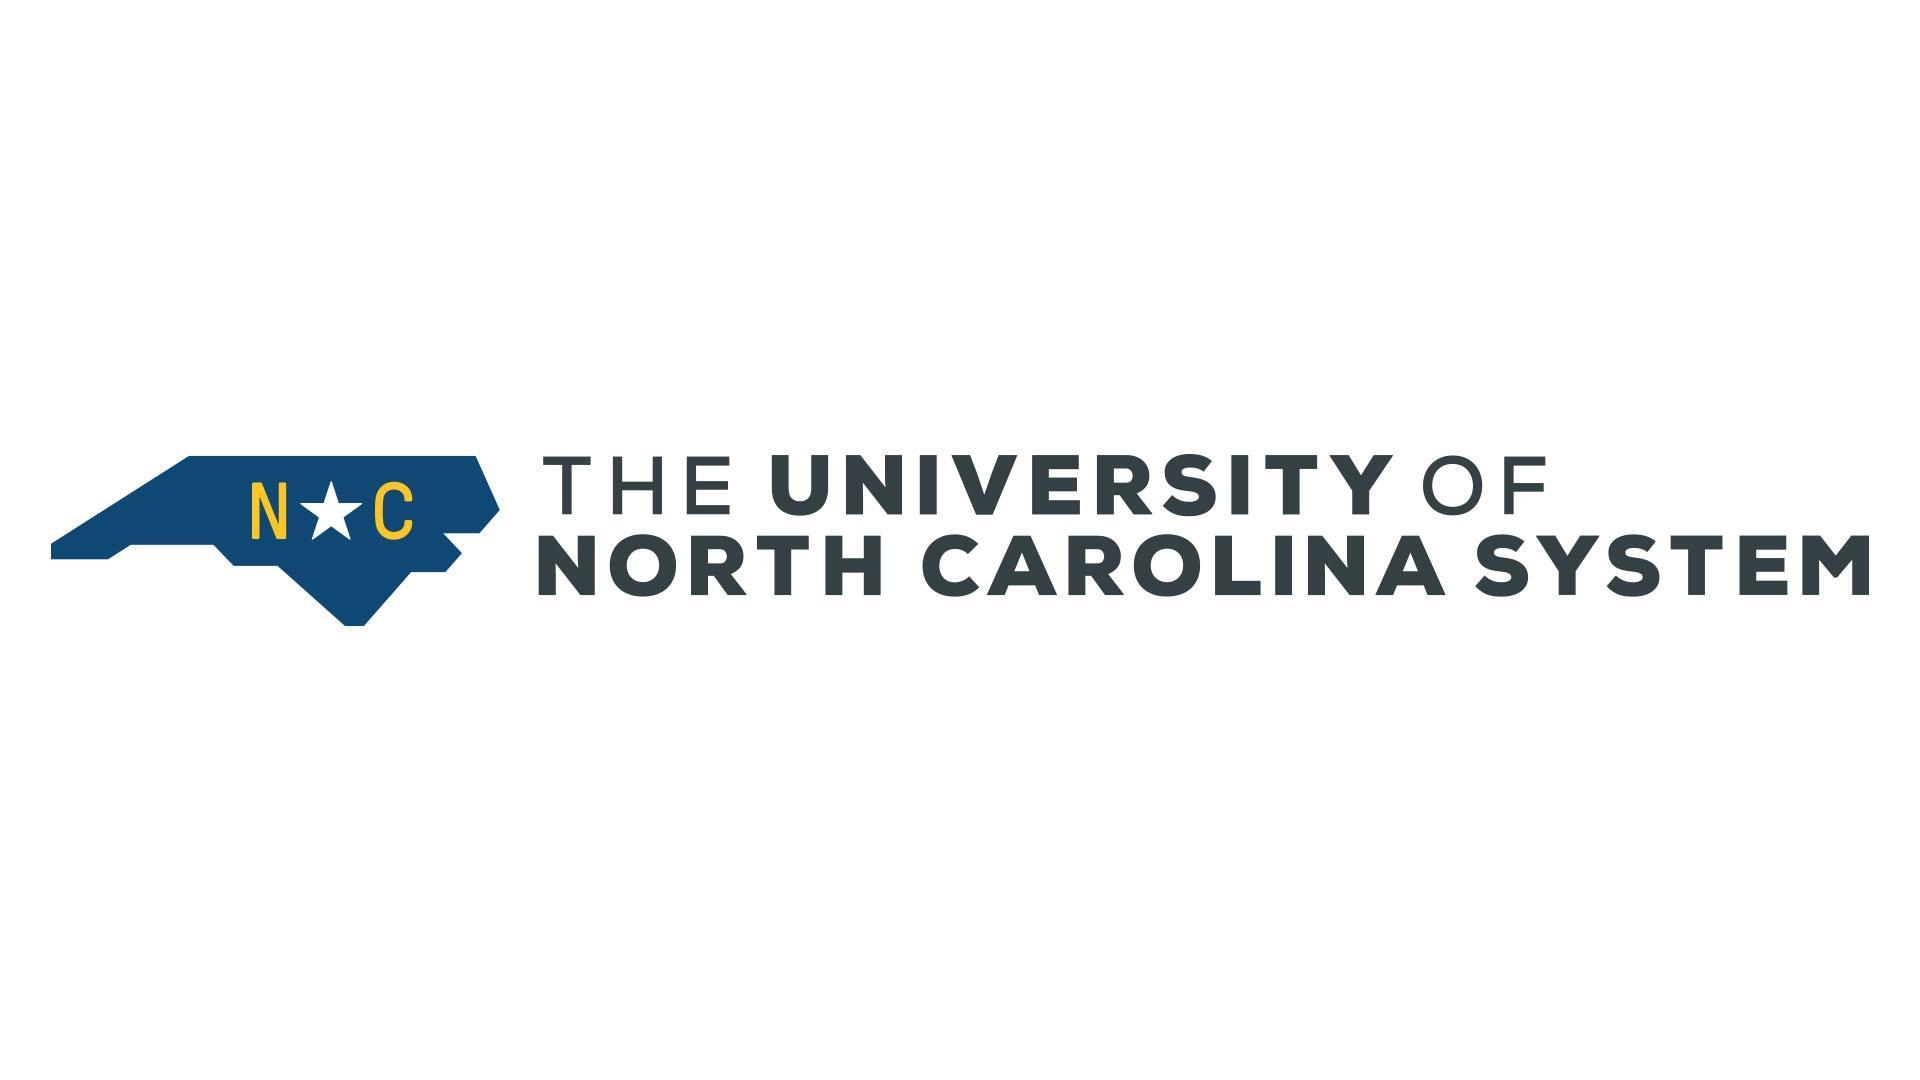 The University of North Carolina System